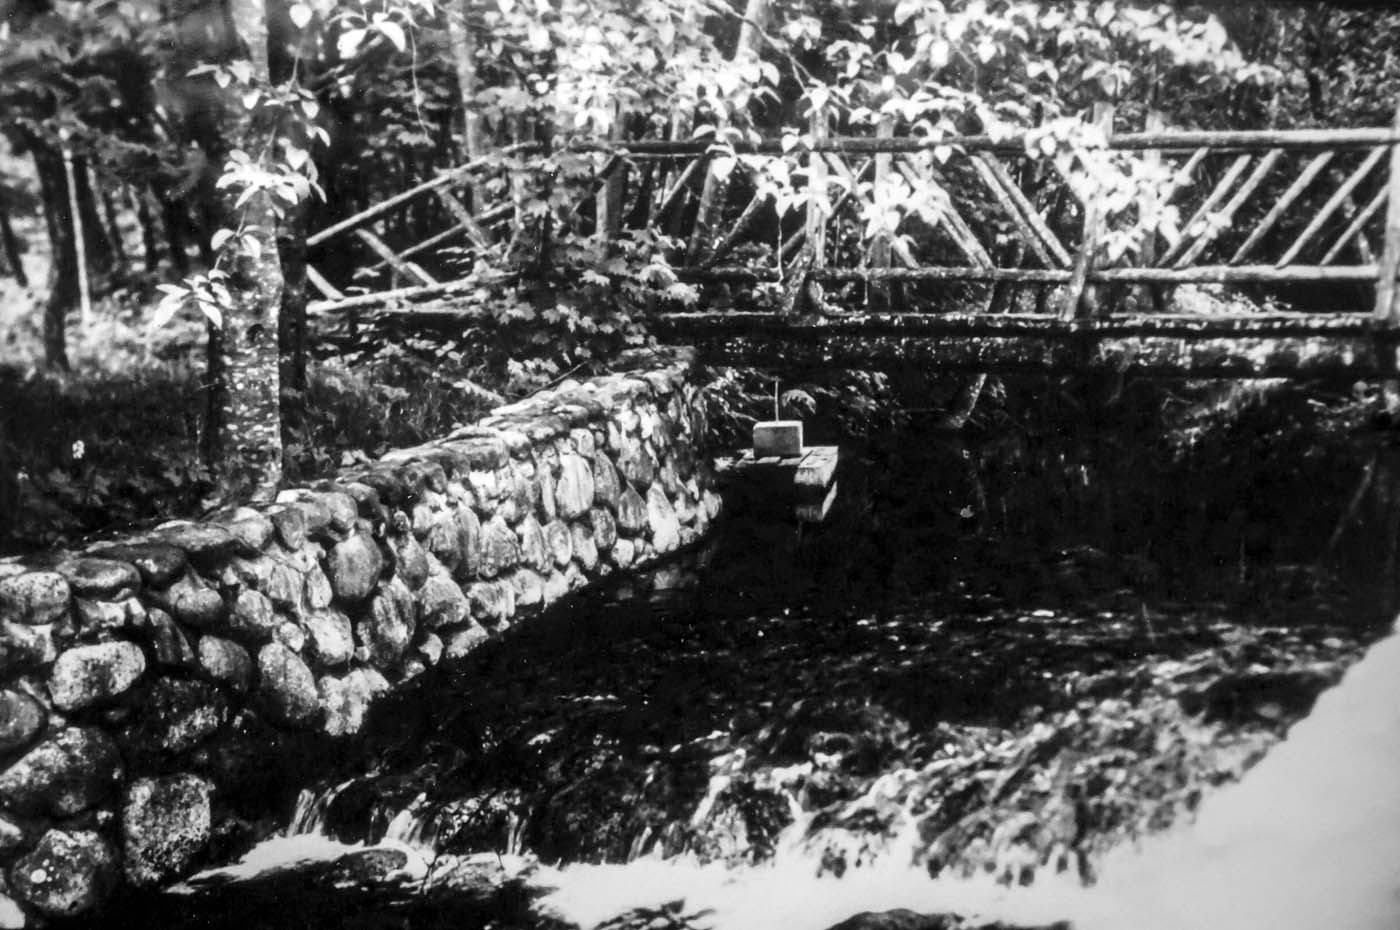 Hoy Creek bridge on Brewer property (adjacent to today's Hoy Creek Hatchery building)